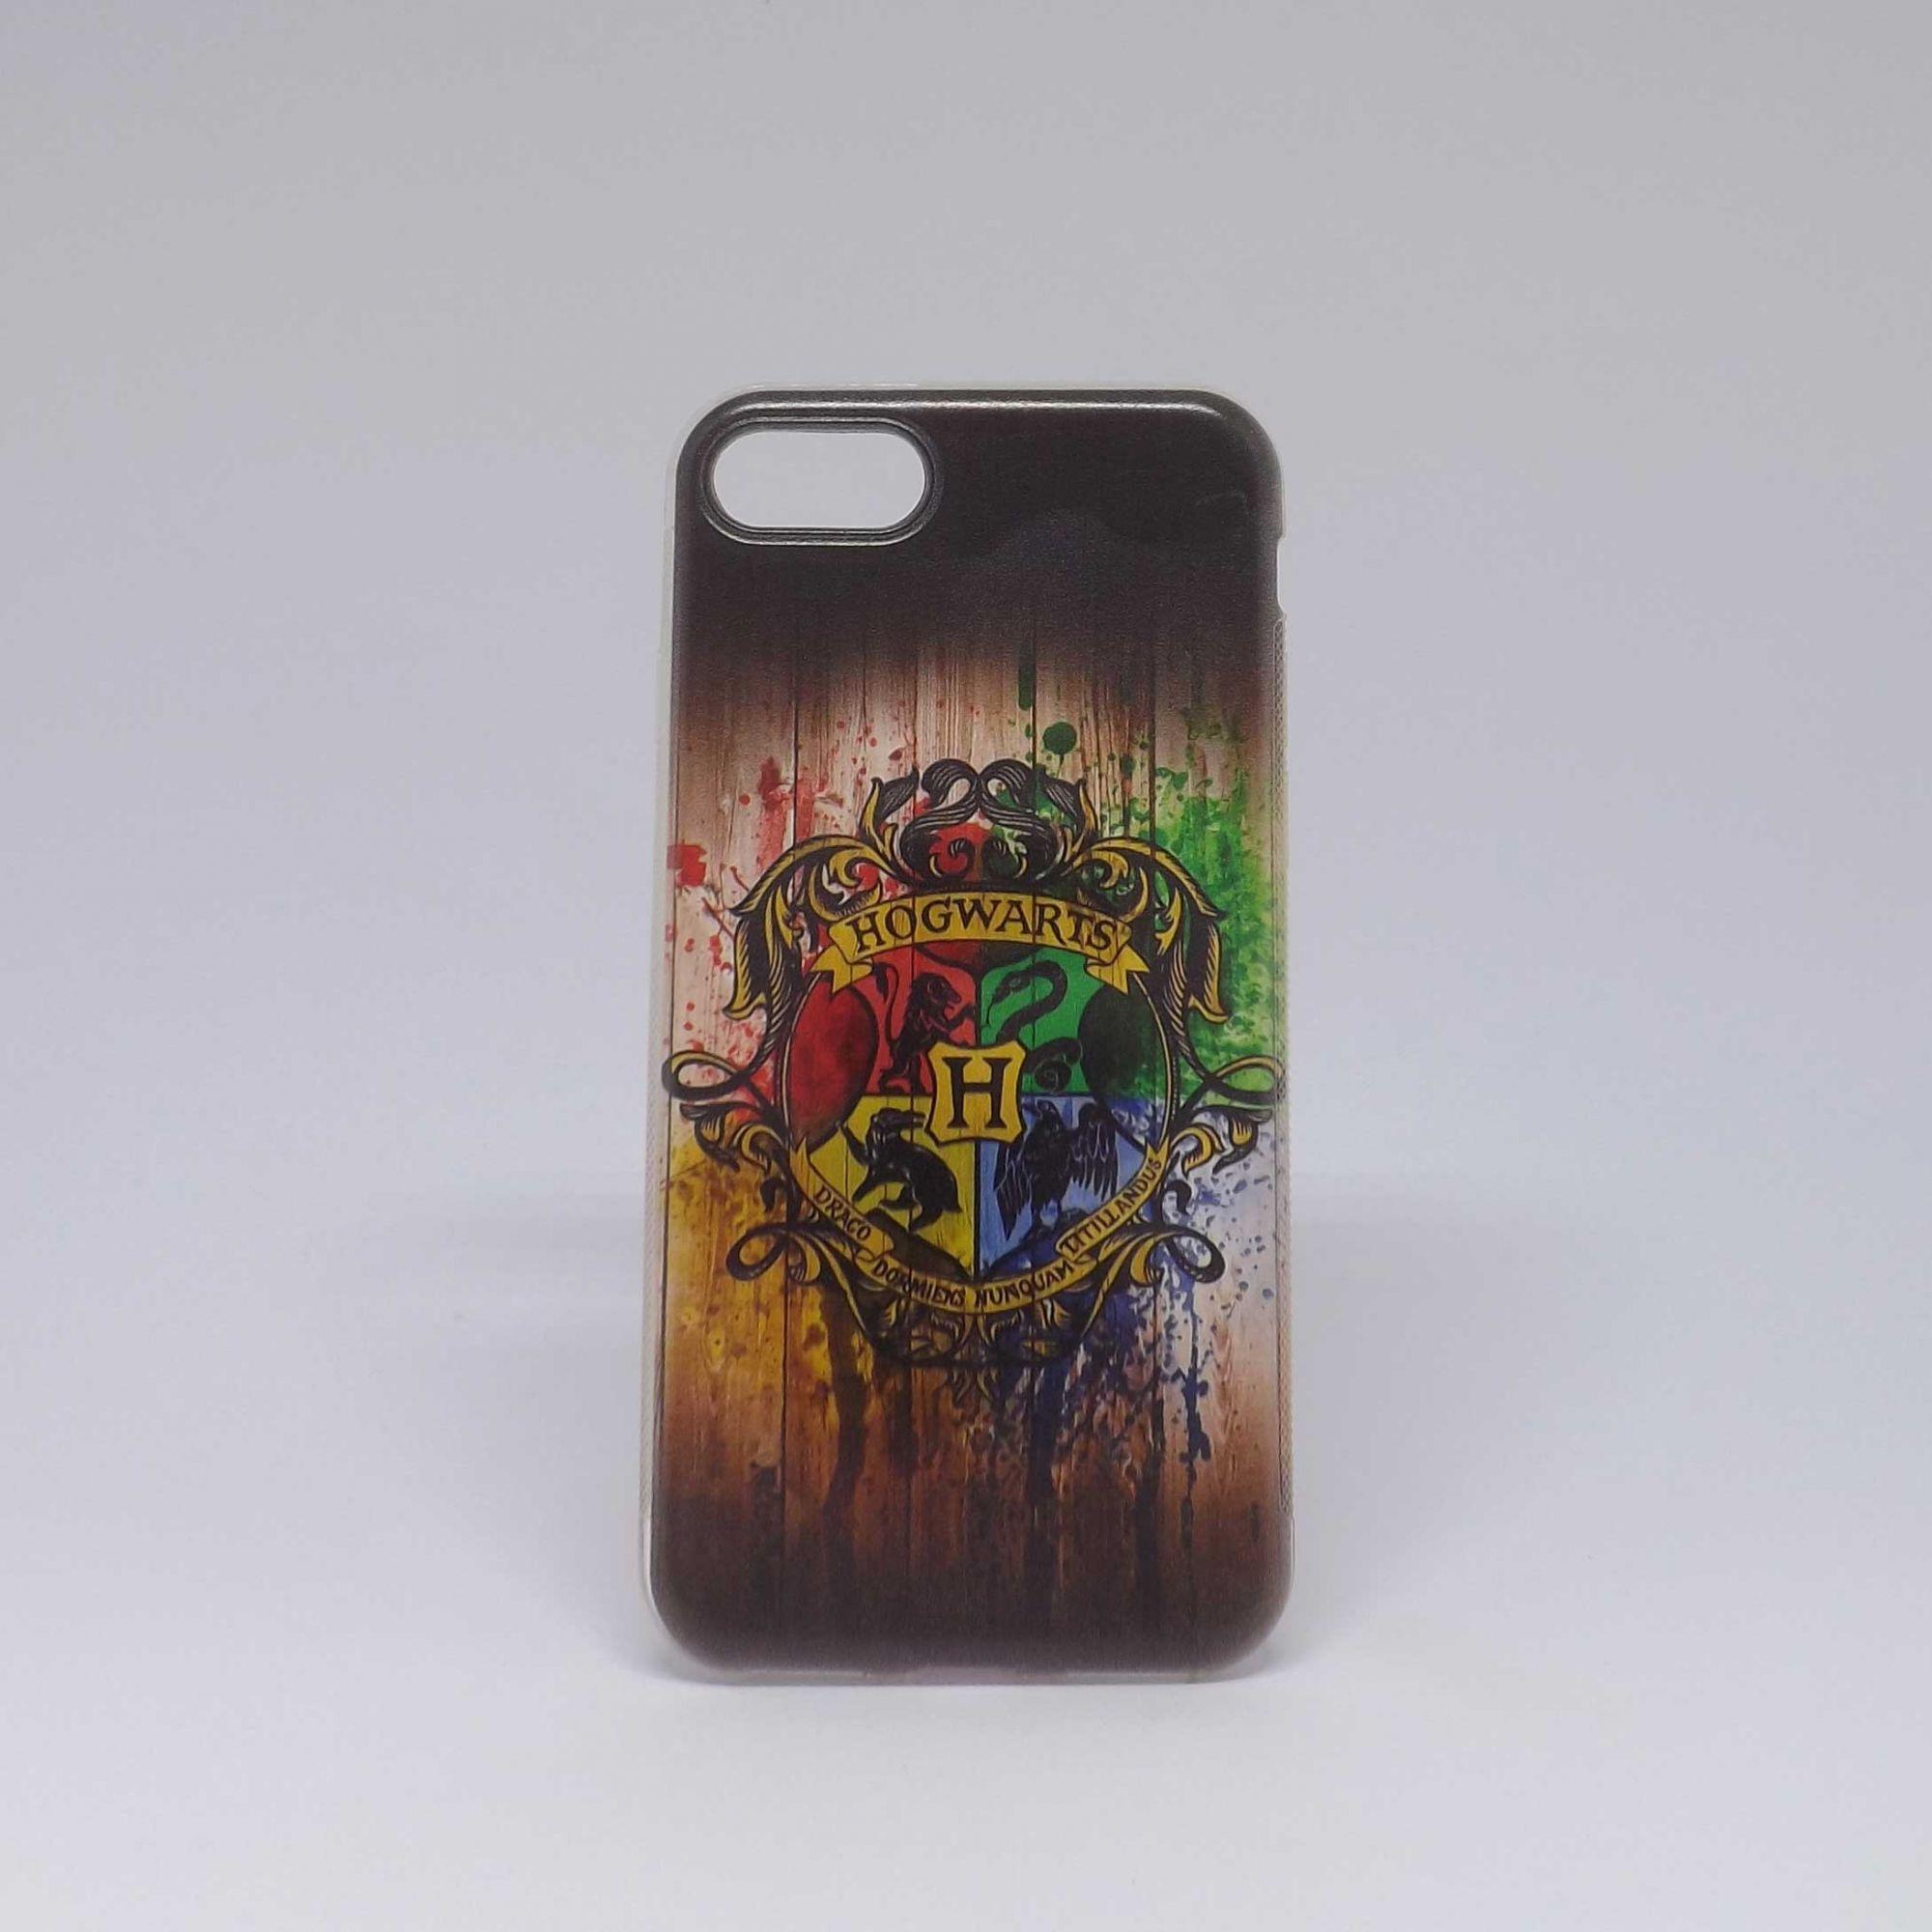 Capa iPhone 7/8 Netcase